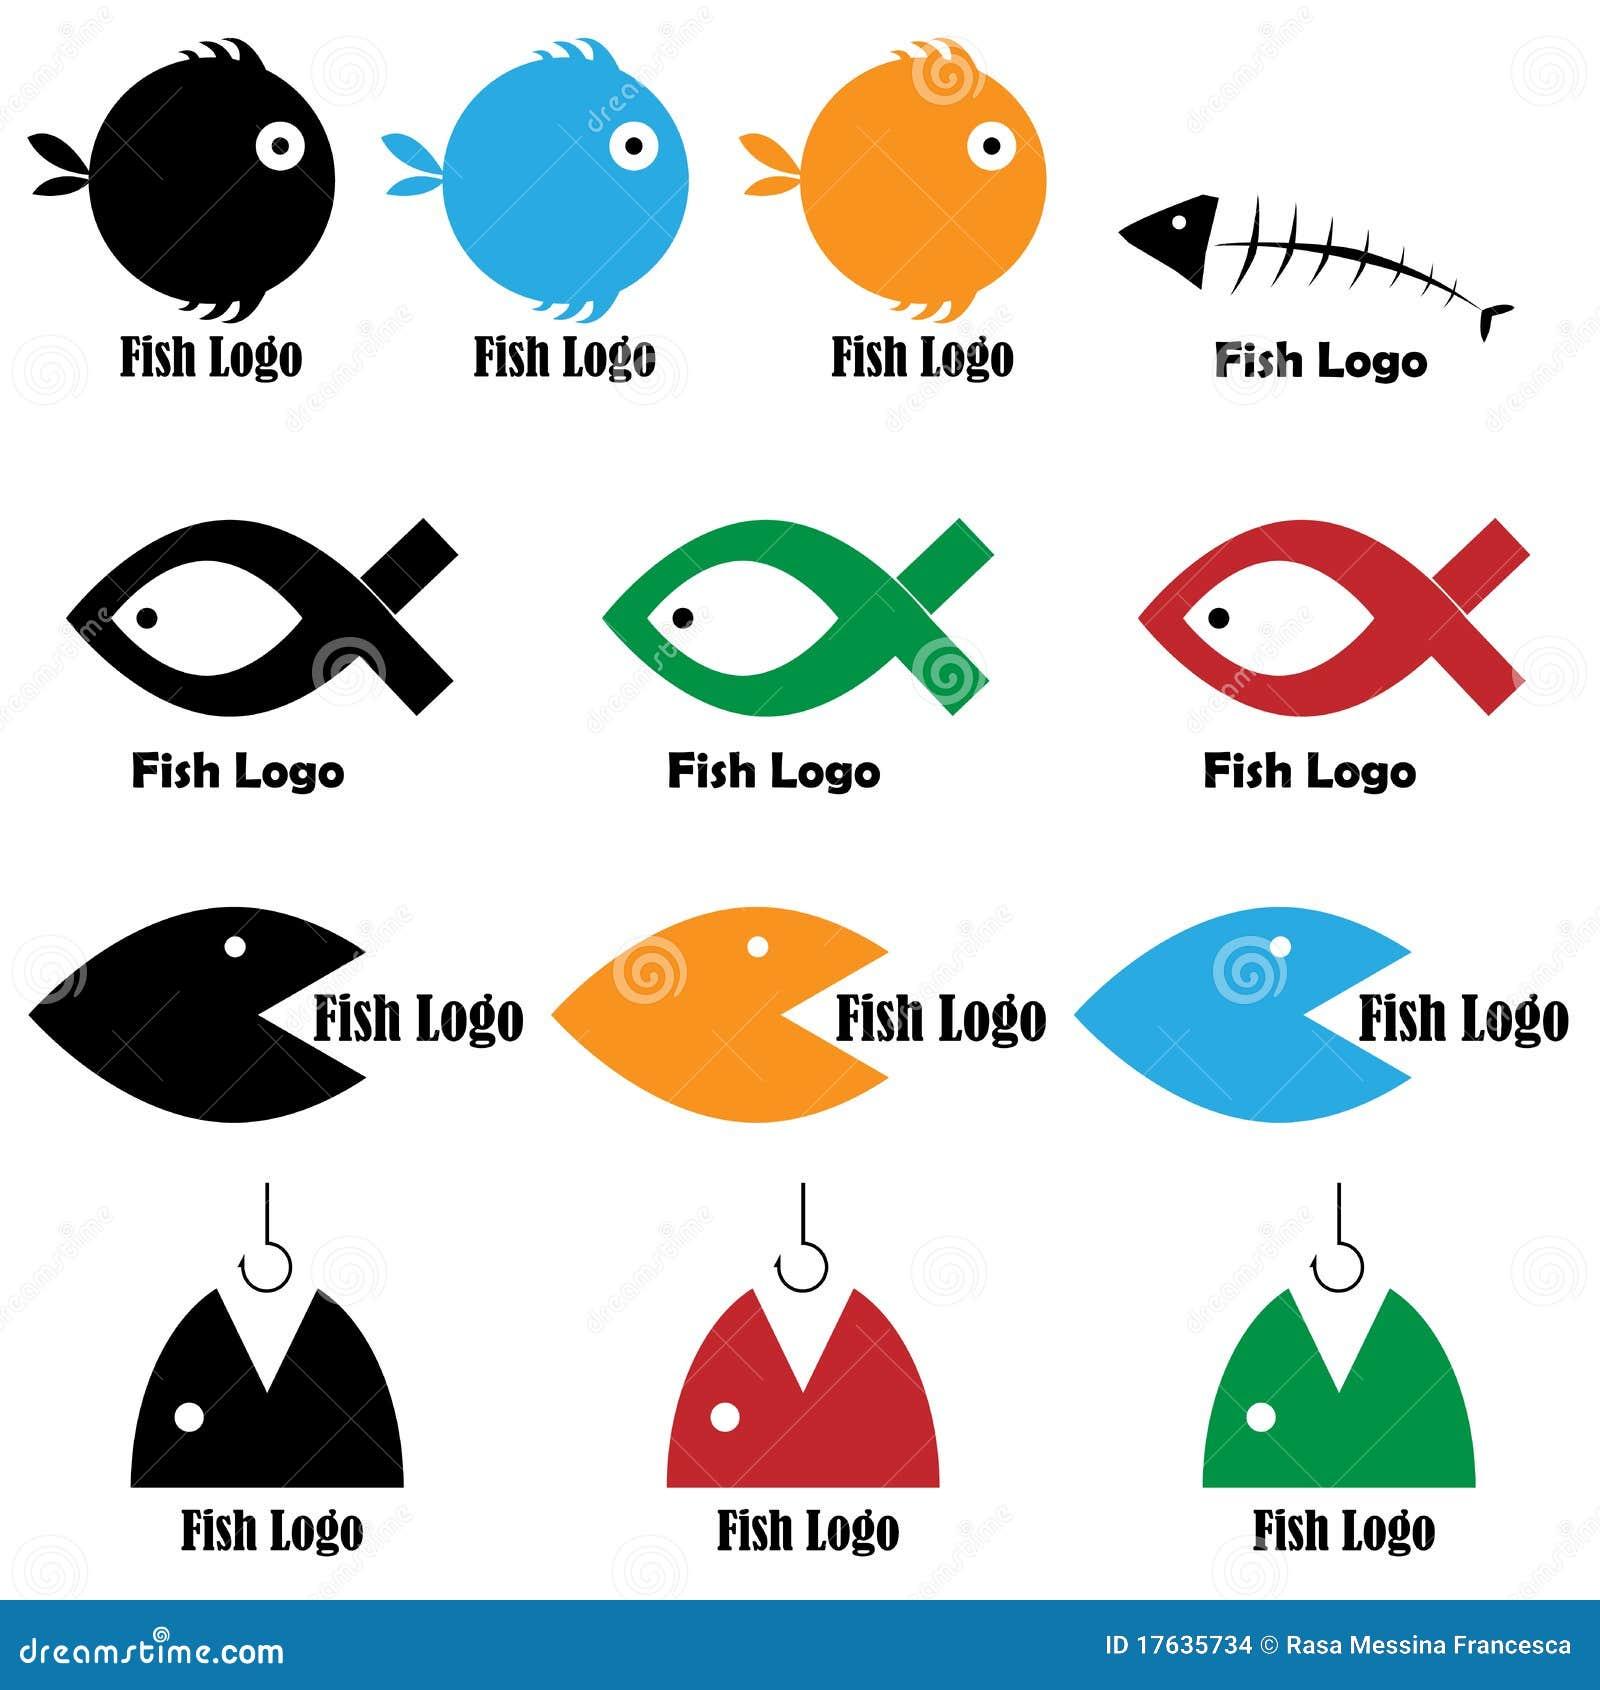 Fish Logos Stock Vector. Illustration Of Logos, Green